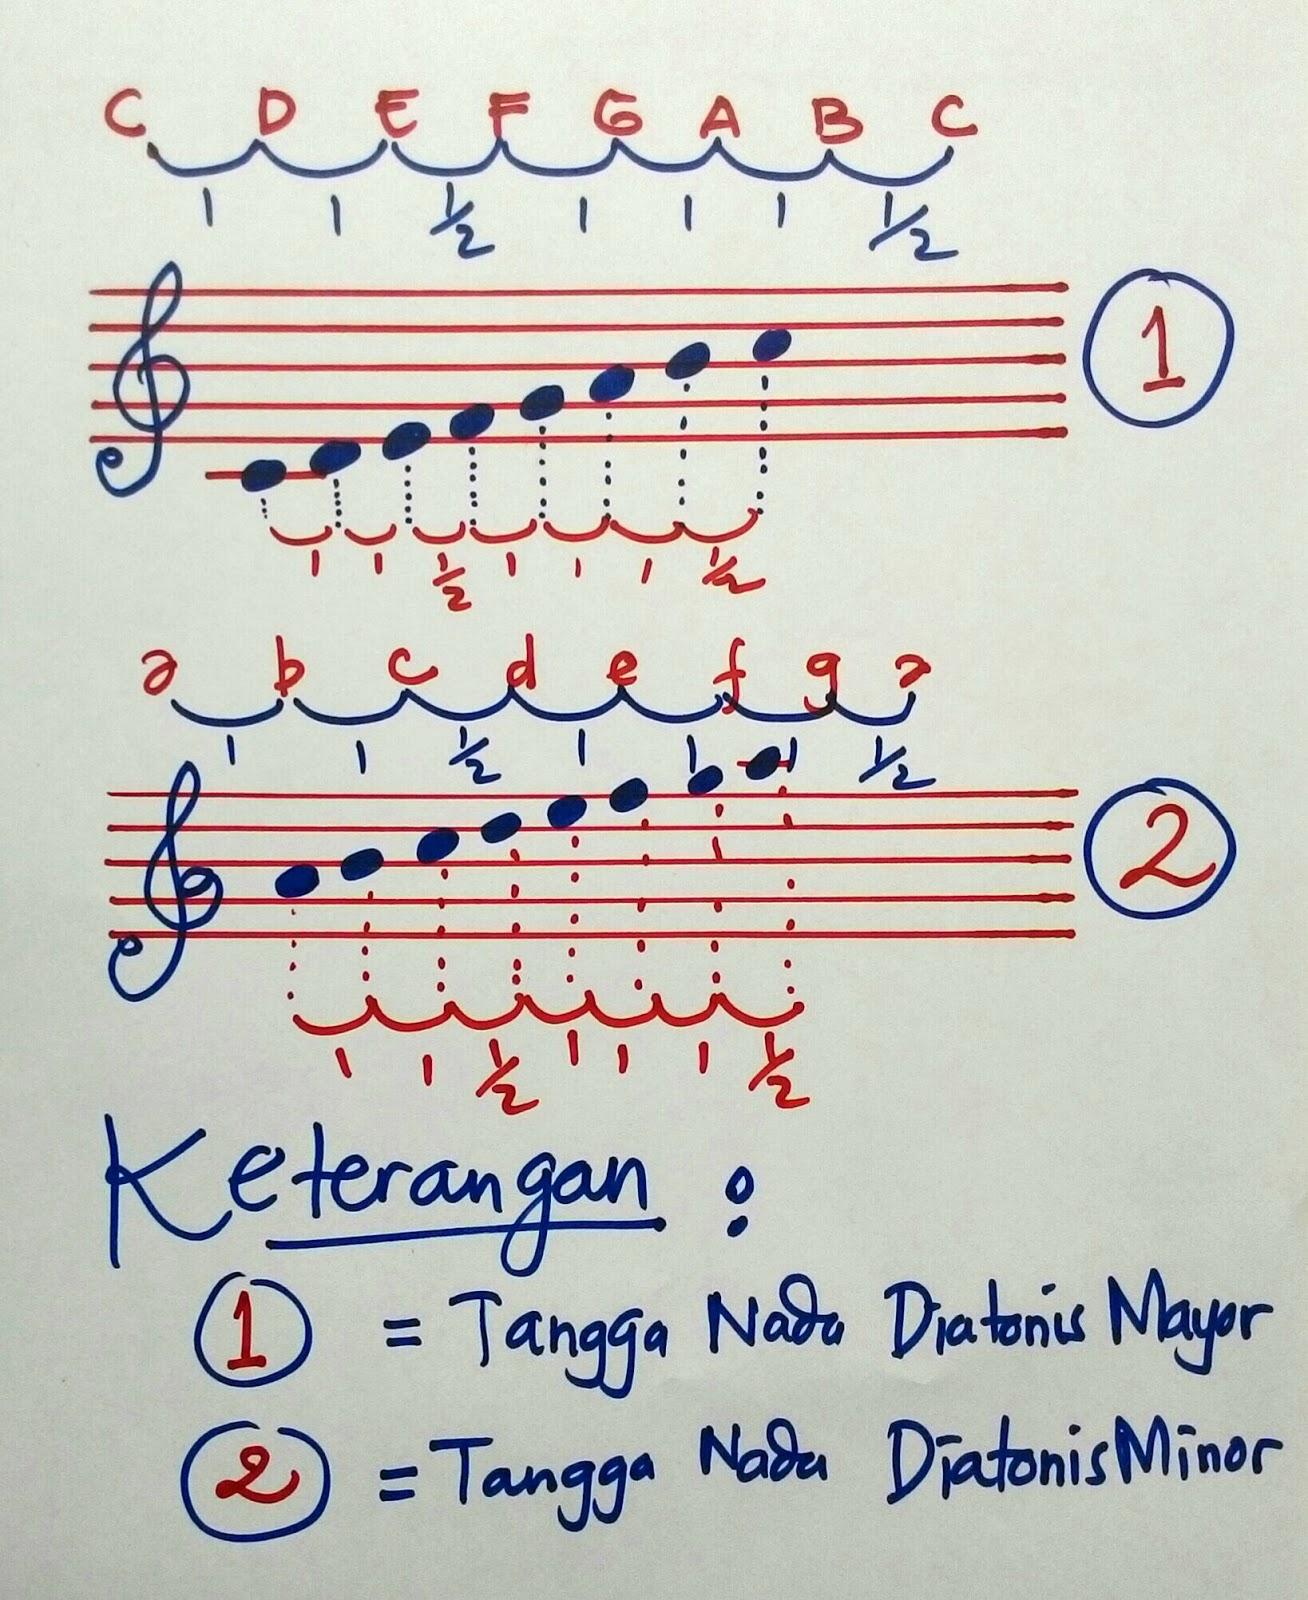 Tangga Nada Pentatonik : tangga, pentatonik, Tangga, Diatonis, Pentatonis, Channel